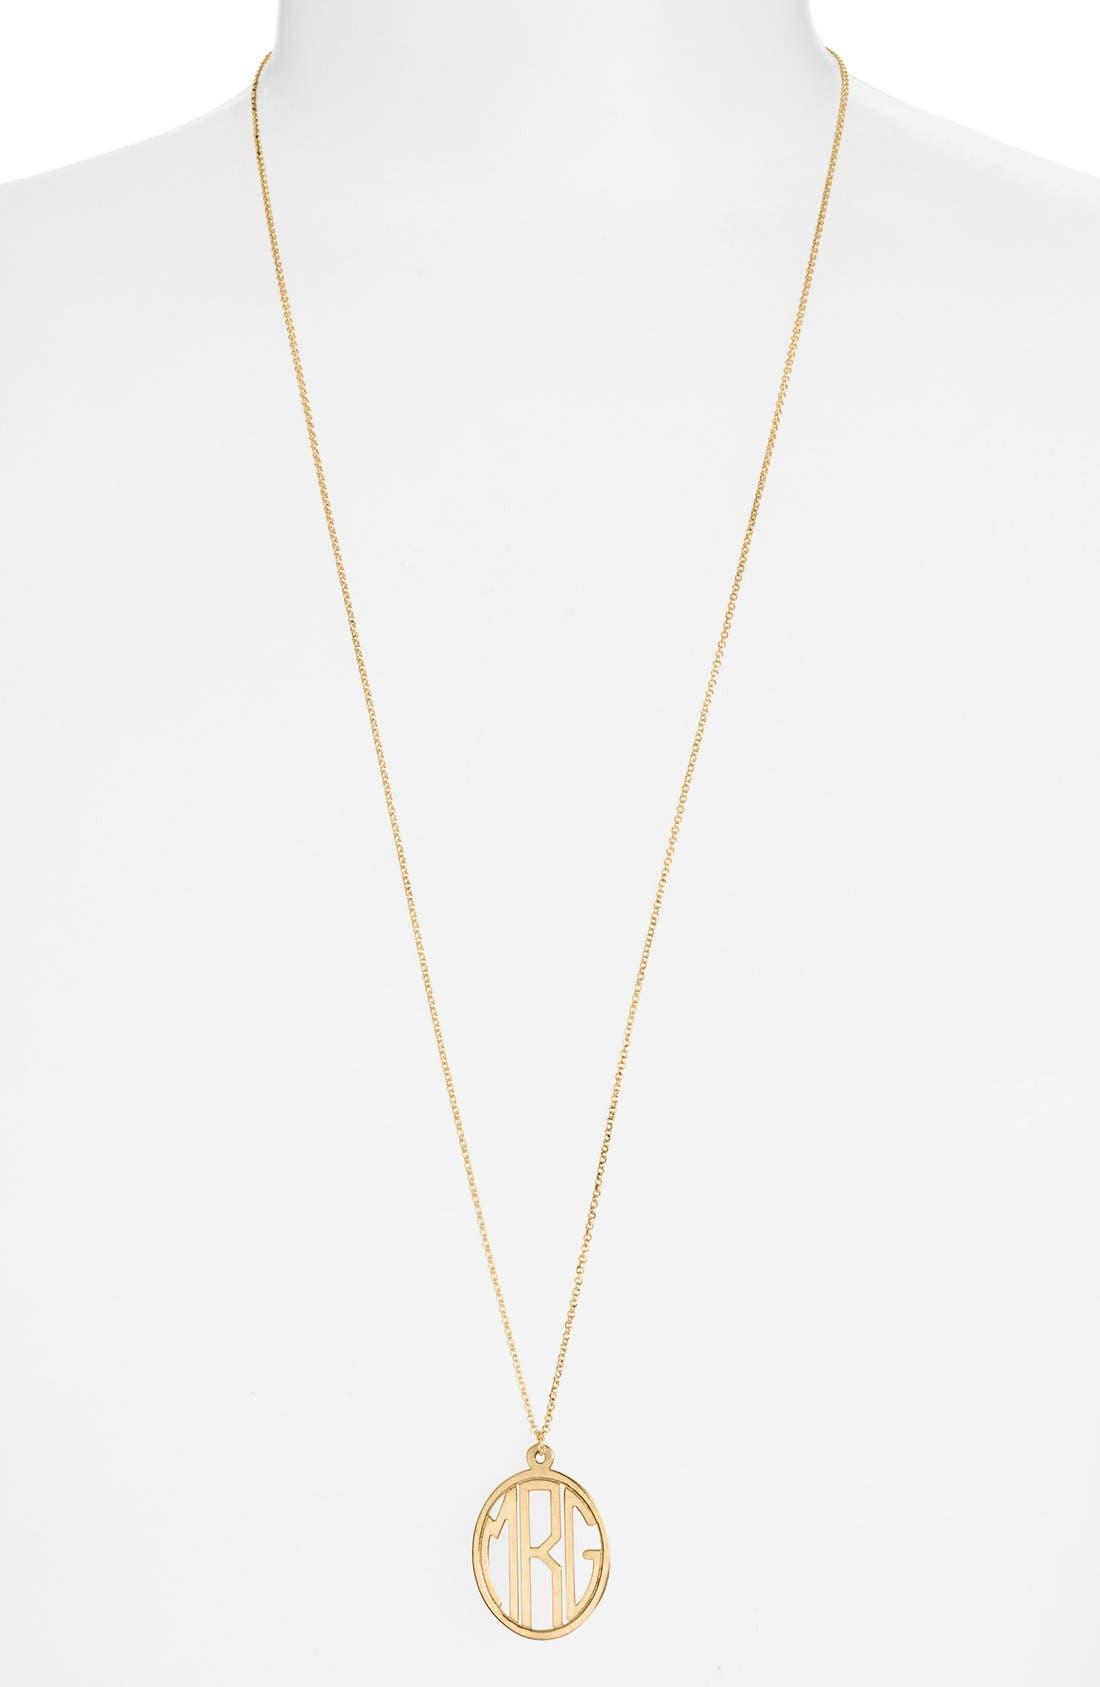 Personalized Monogram Pendant Necklace,                             Main thumbnail 1, color,                             GOLD